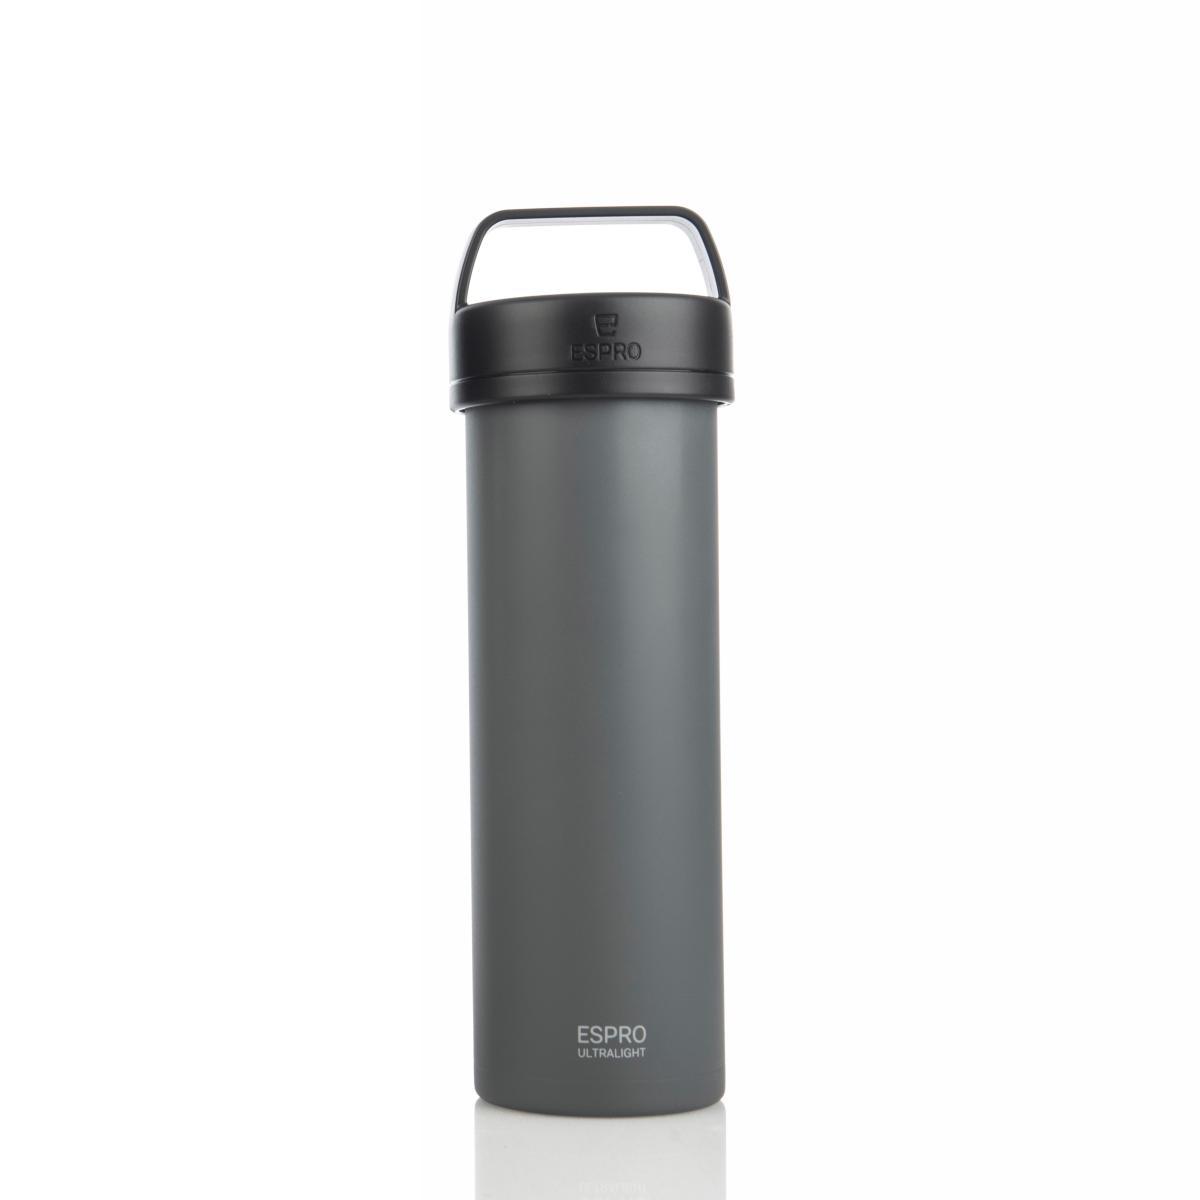 ESPRO Ultralight Kaffeezubereiter / Isolierflasche 475ml Edelstahl gun grey